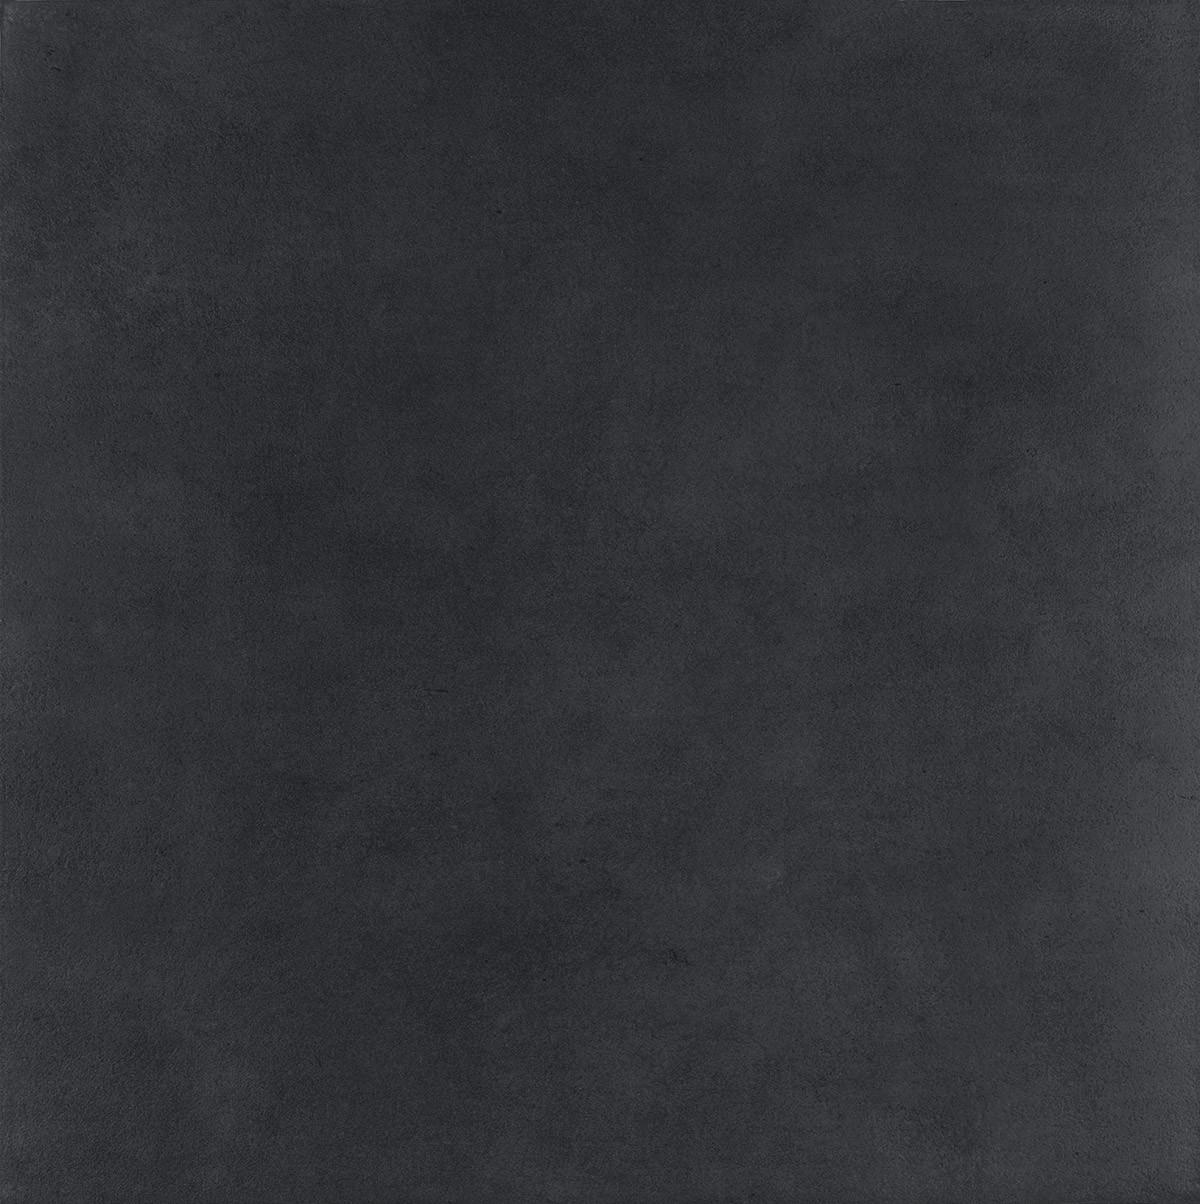 Texture carrelage anthracite - Atwebster.fr - Maison et mobilier